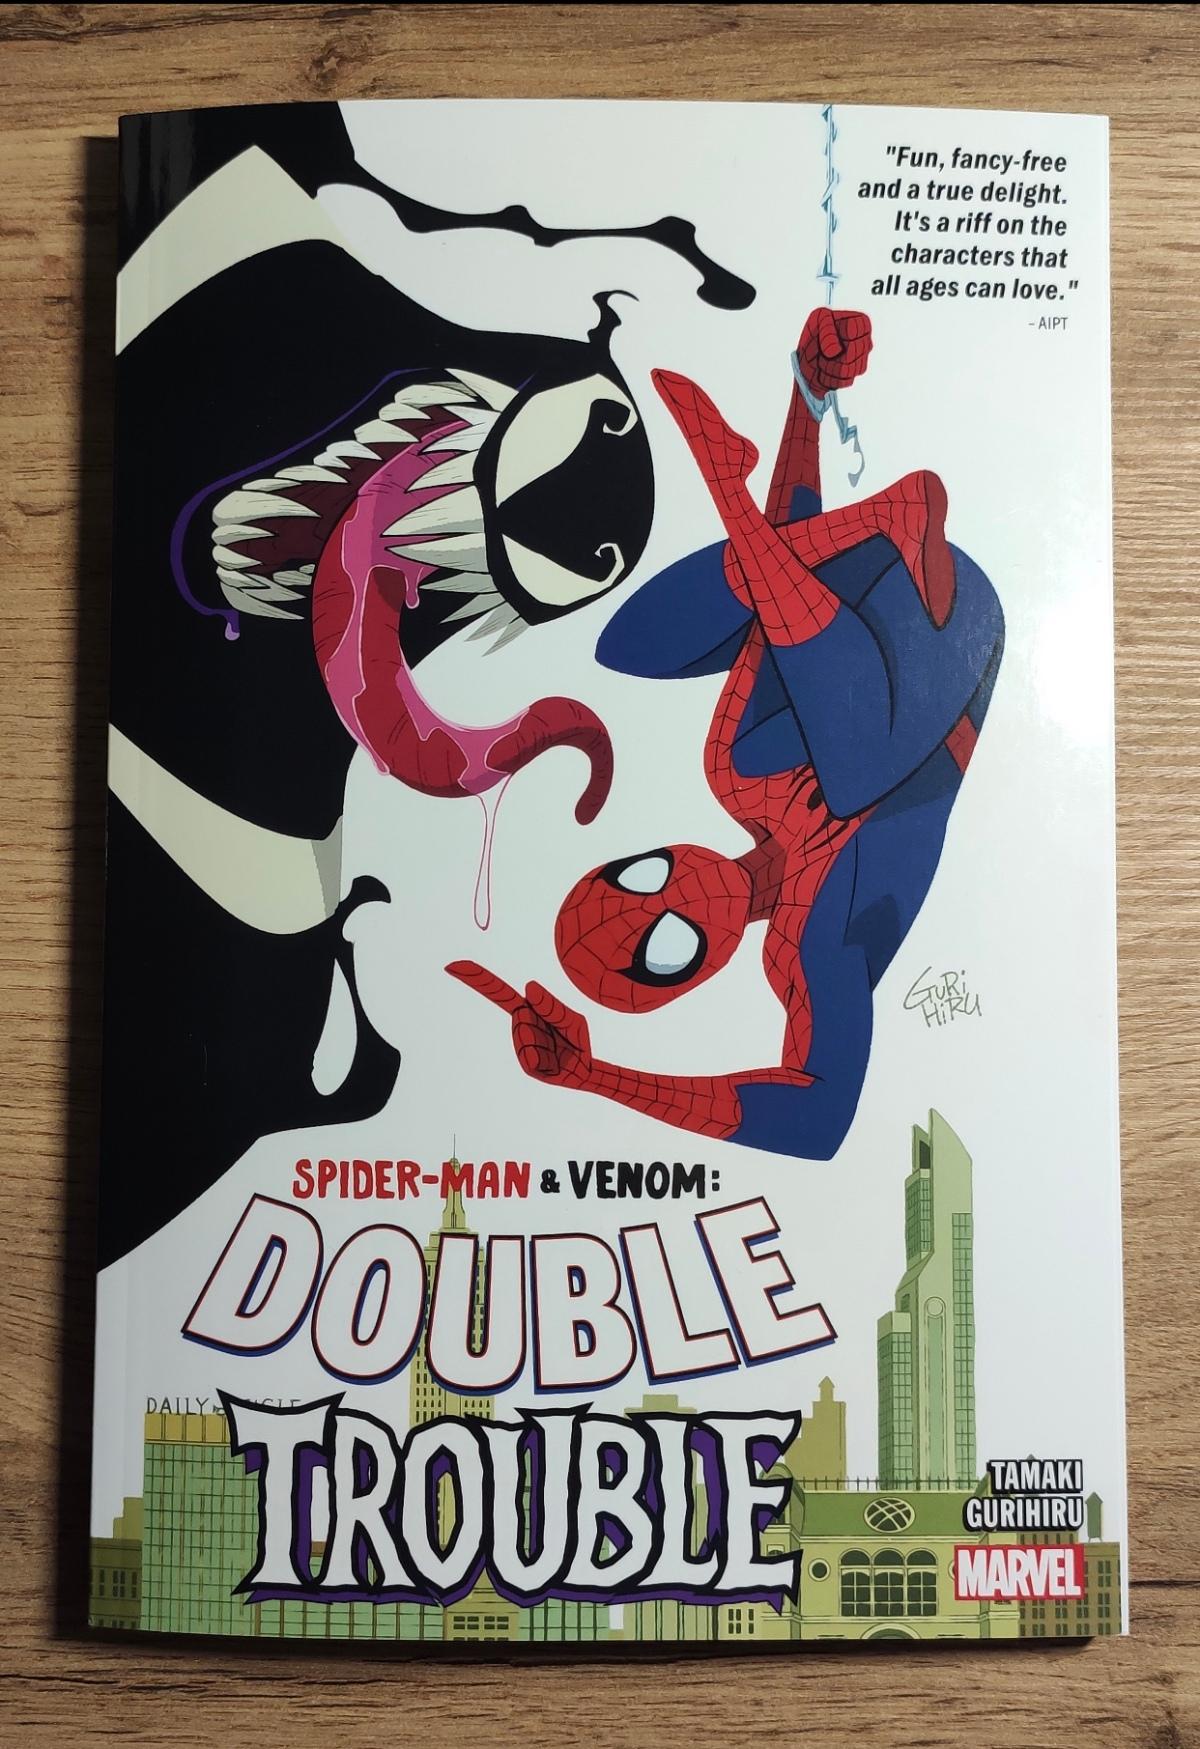 Spider-Man & Venom: Double Trouble | Review[Gastbeitrag]